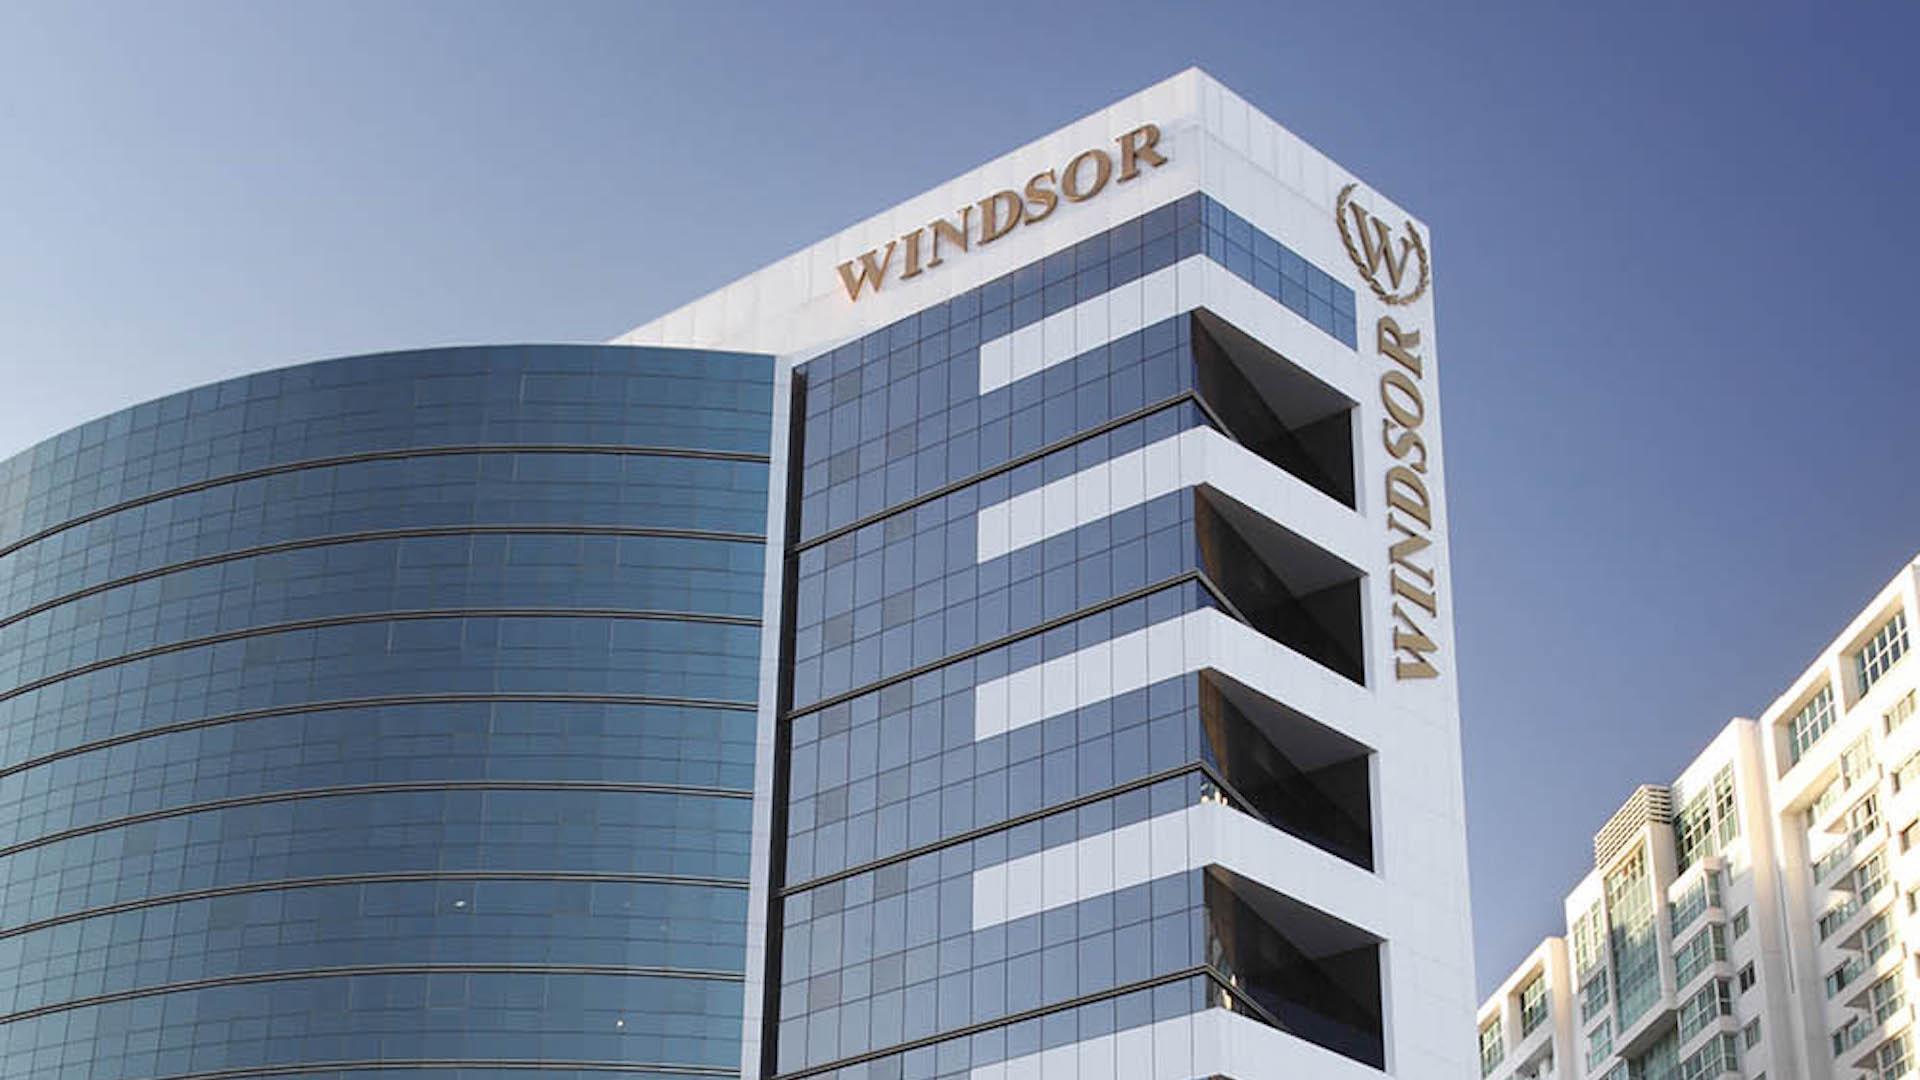 Fassade Hotel Windsor Brasilia